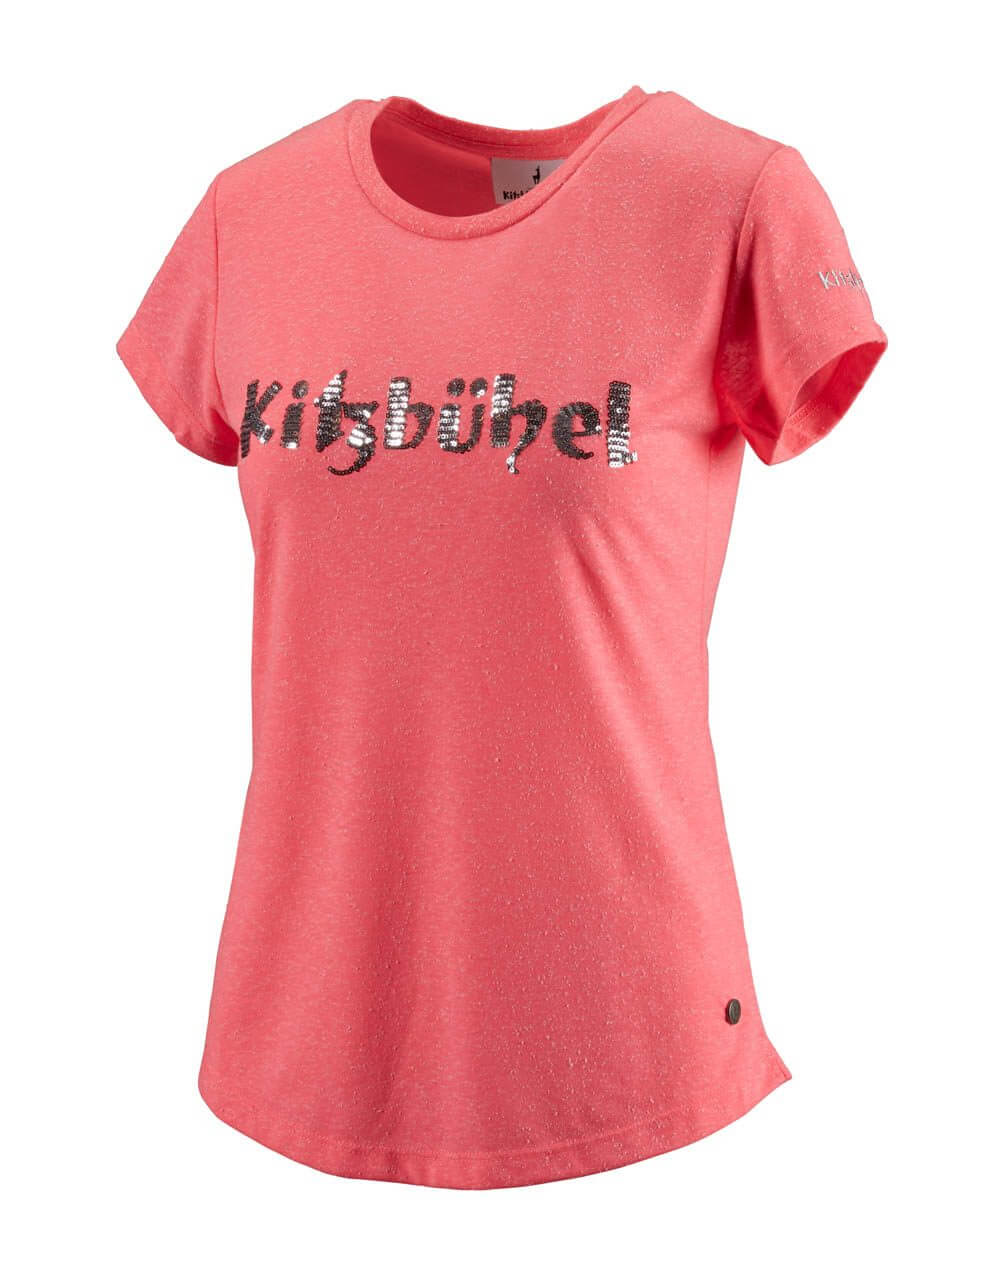 681760932 Damen T-Shirt coralle